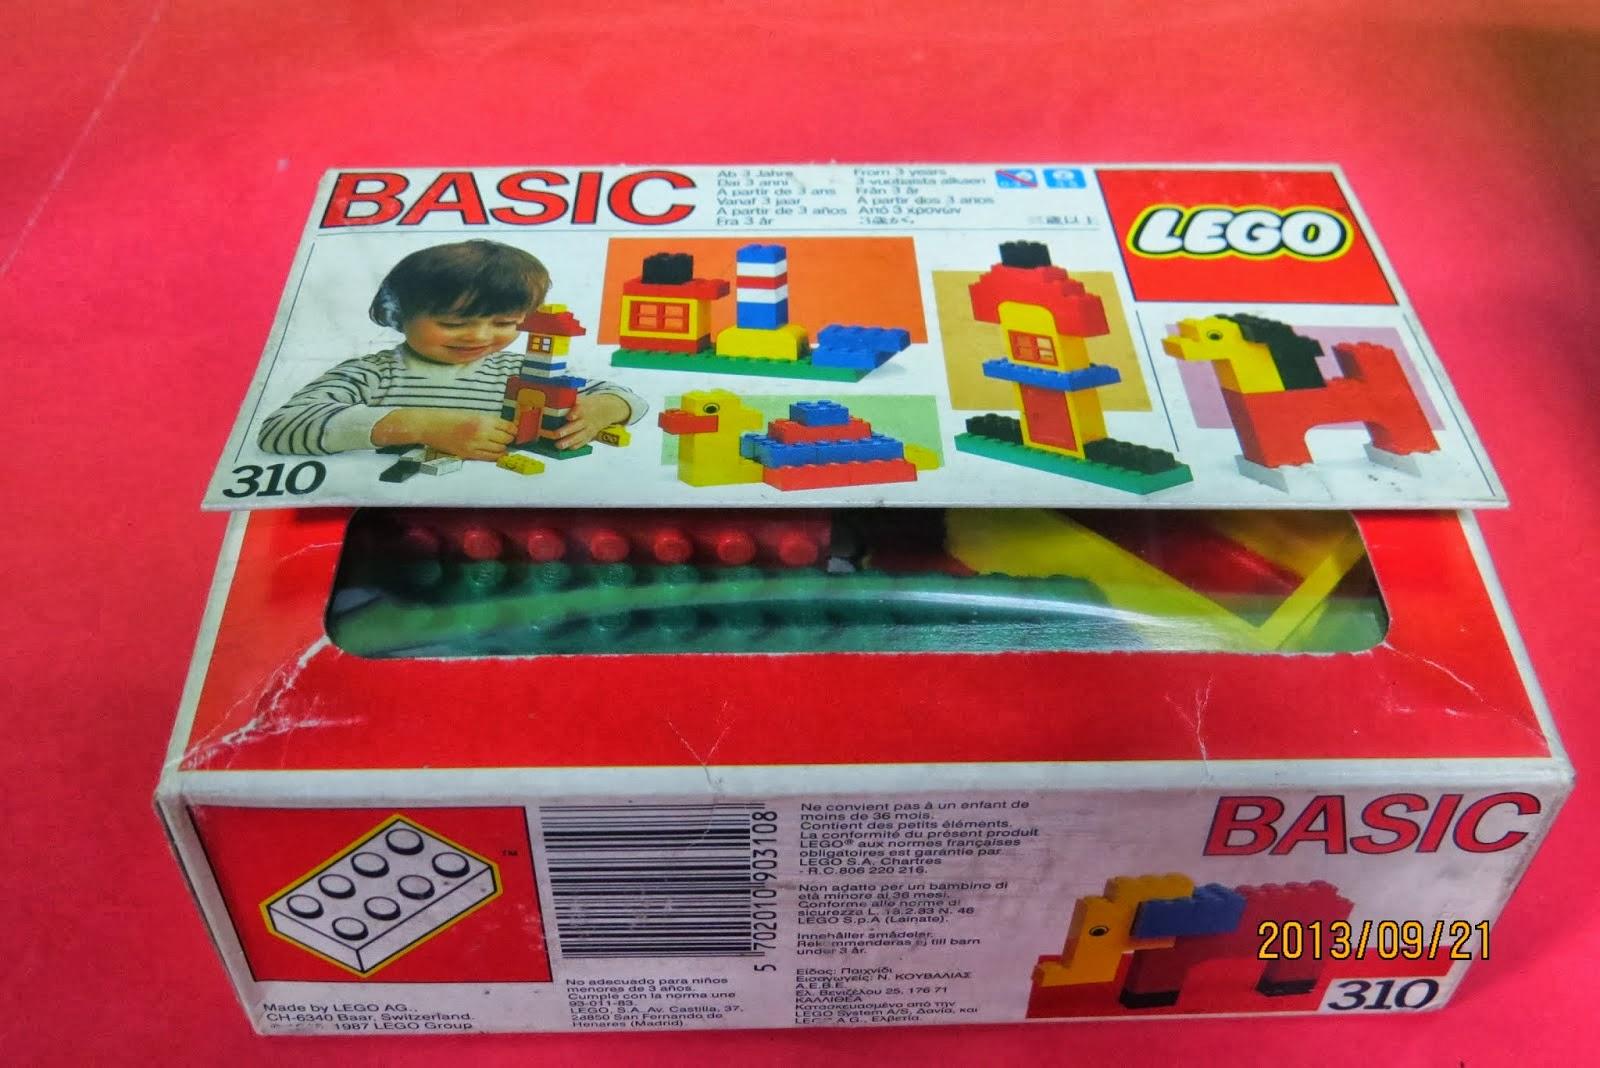 Robot Hualien: 教室樂高收藏--No 310; LEGO的意思及座右銘